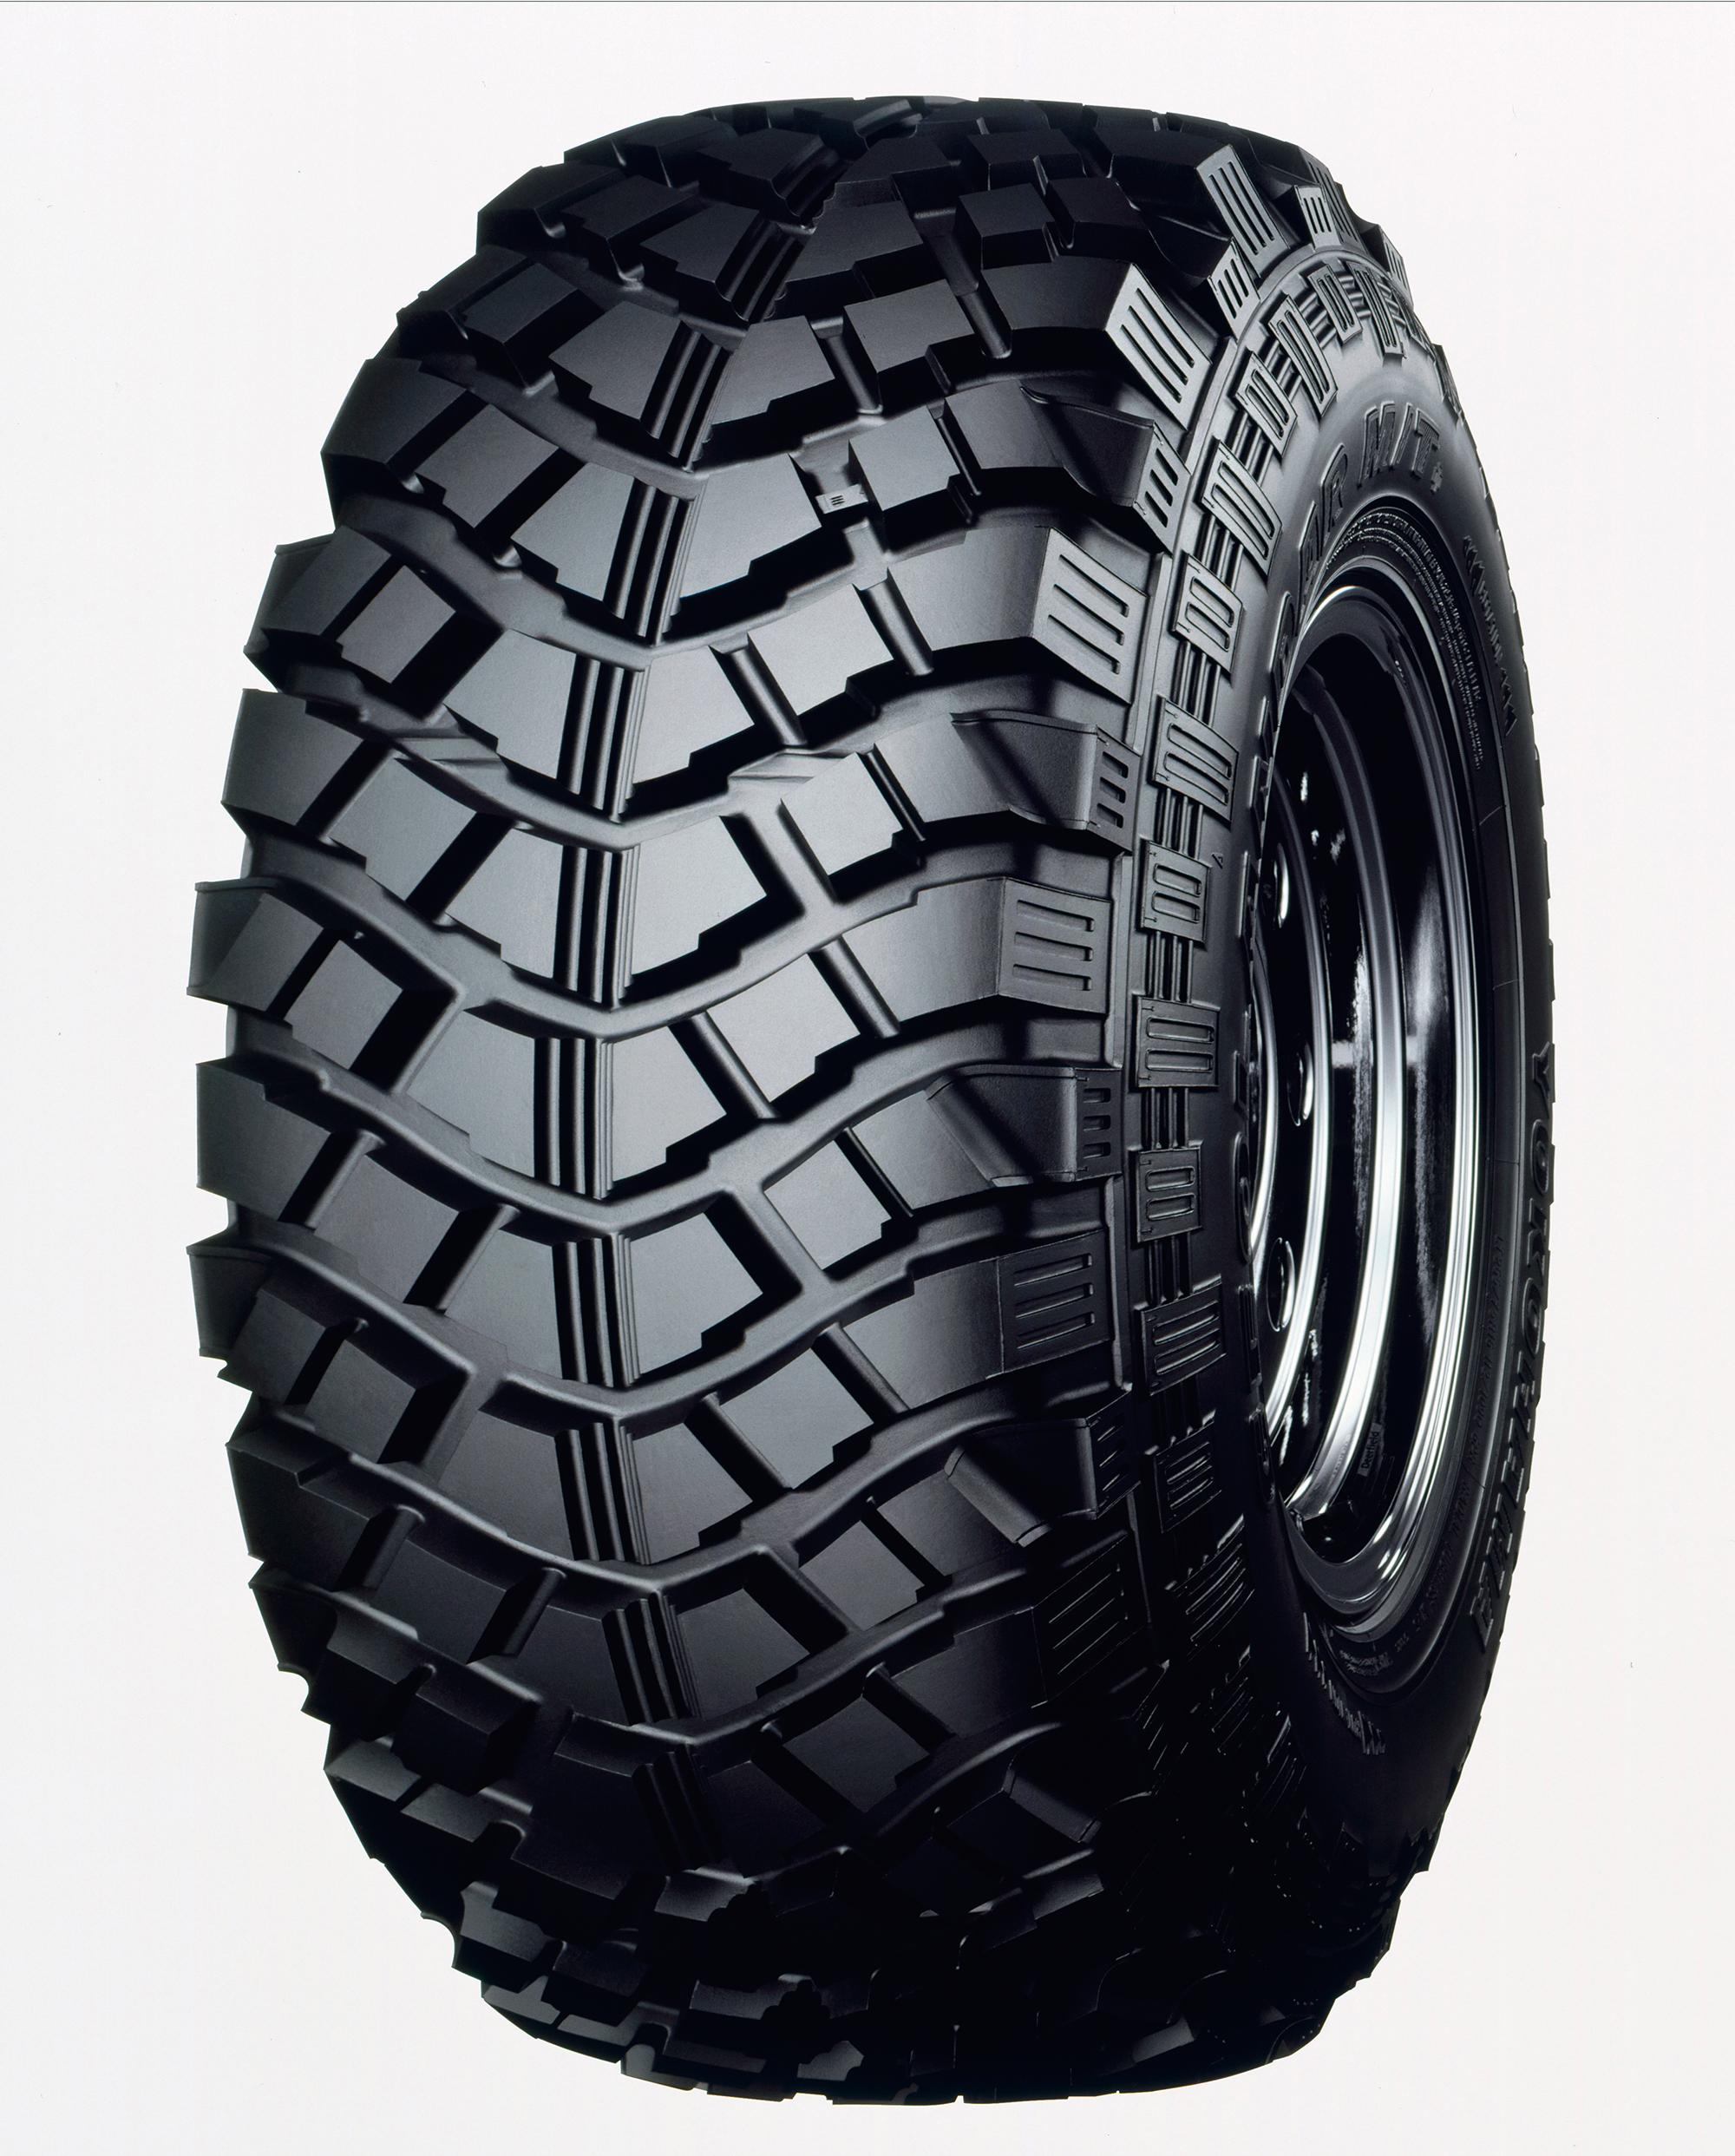 33x12 50r15 Tires >> Yokohama India introduces Mud-Terrain tyres - Autocar India